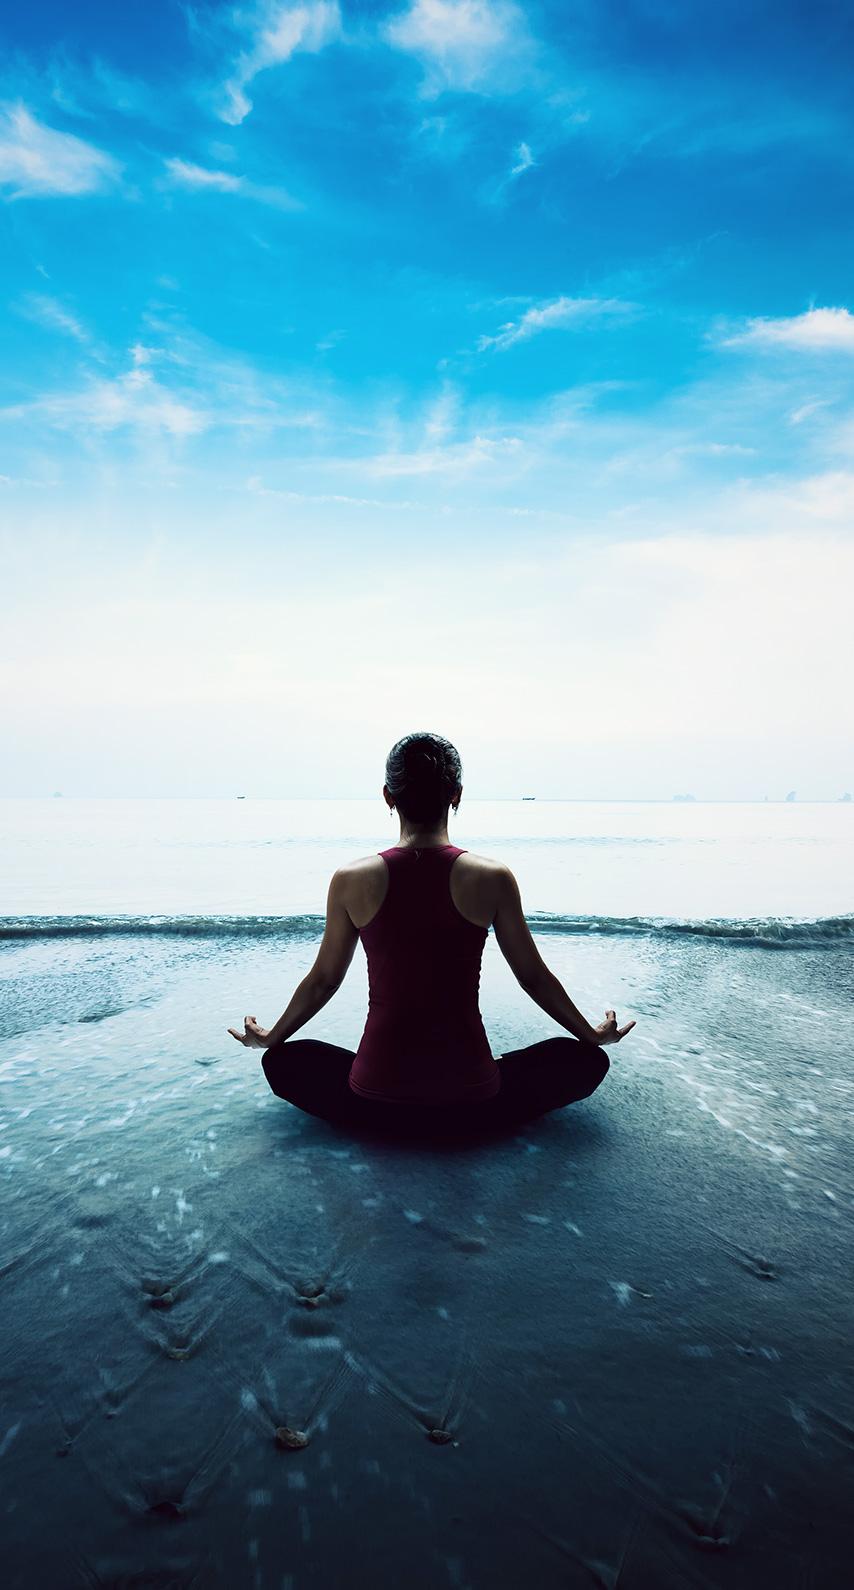 seashore, meditation